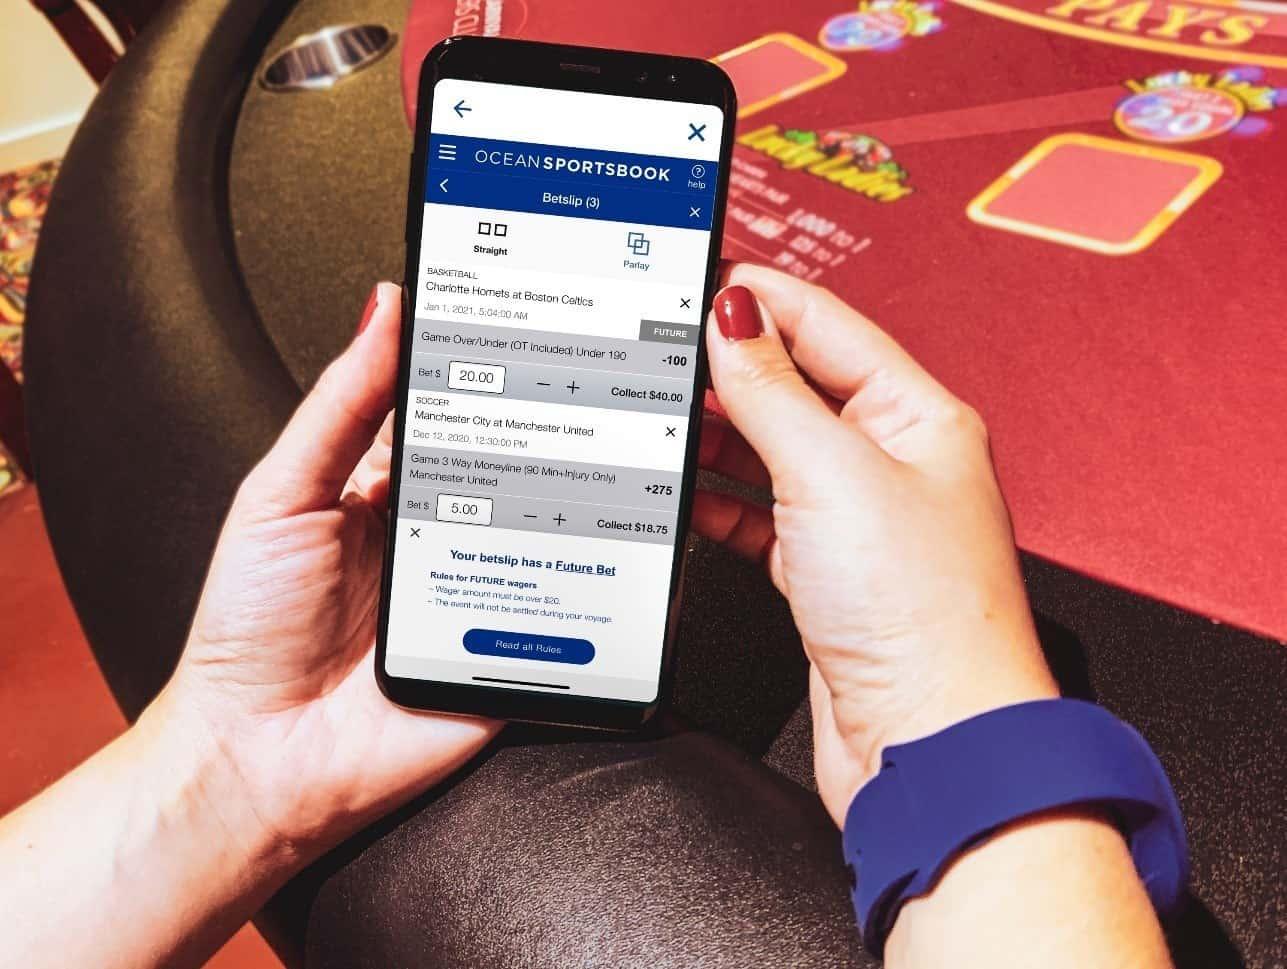 princess cruises ocean sportsbook gambling app